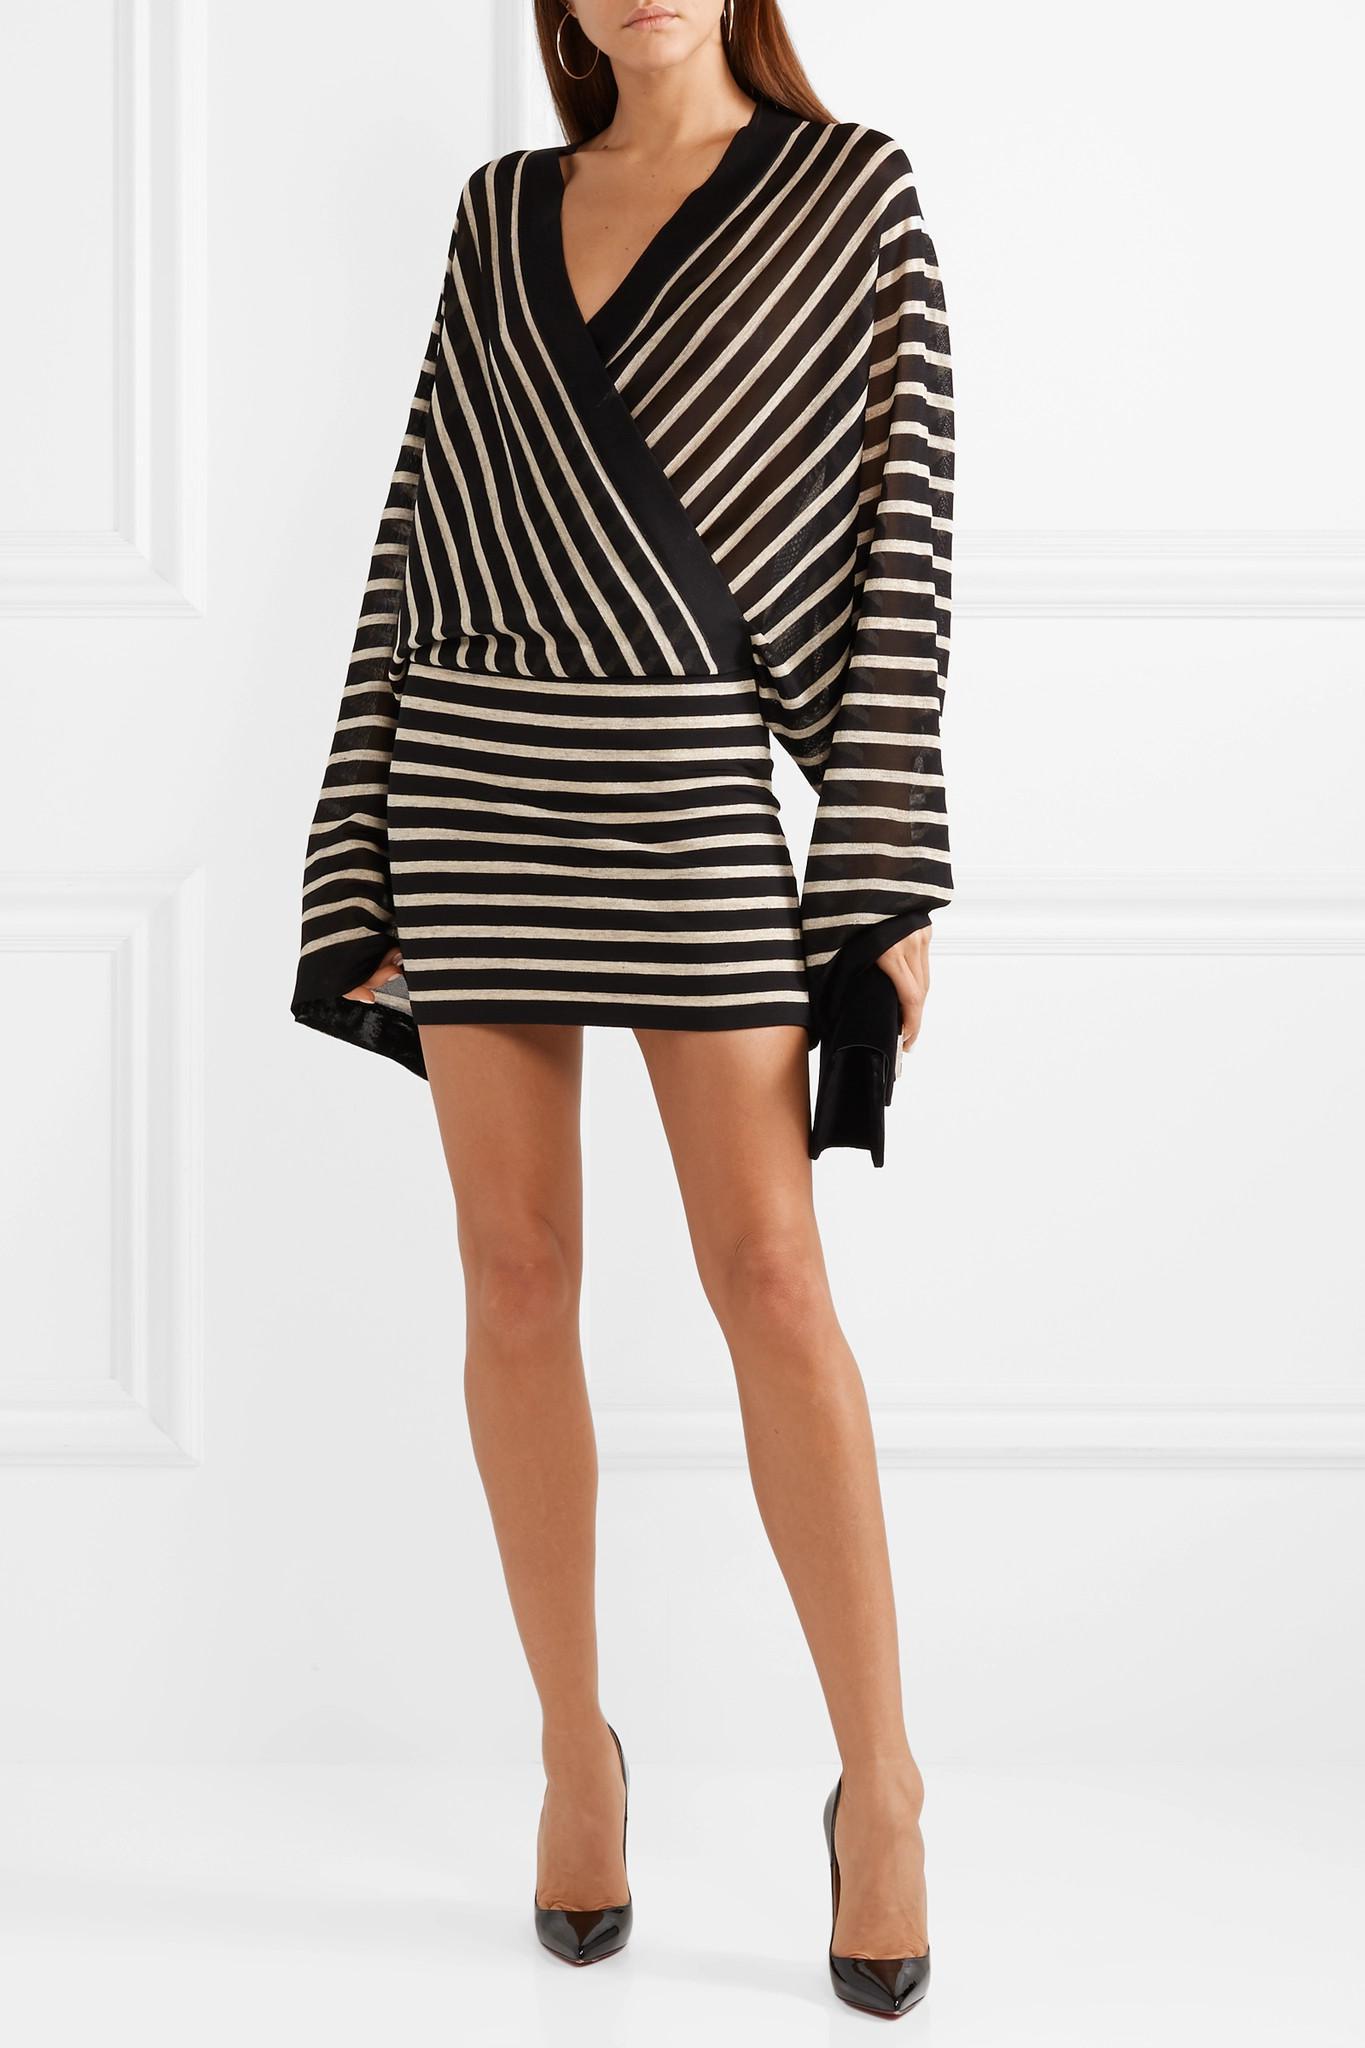 db5c527d Balmain - Black Wrap-effect Metallic Striped Stretch-jersey Mini Dress -  Lyst. View fullscreen